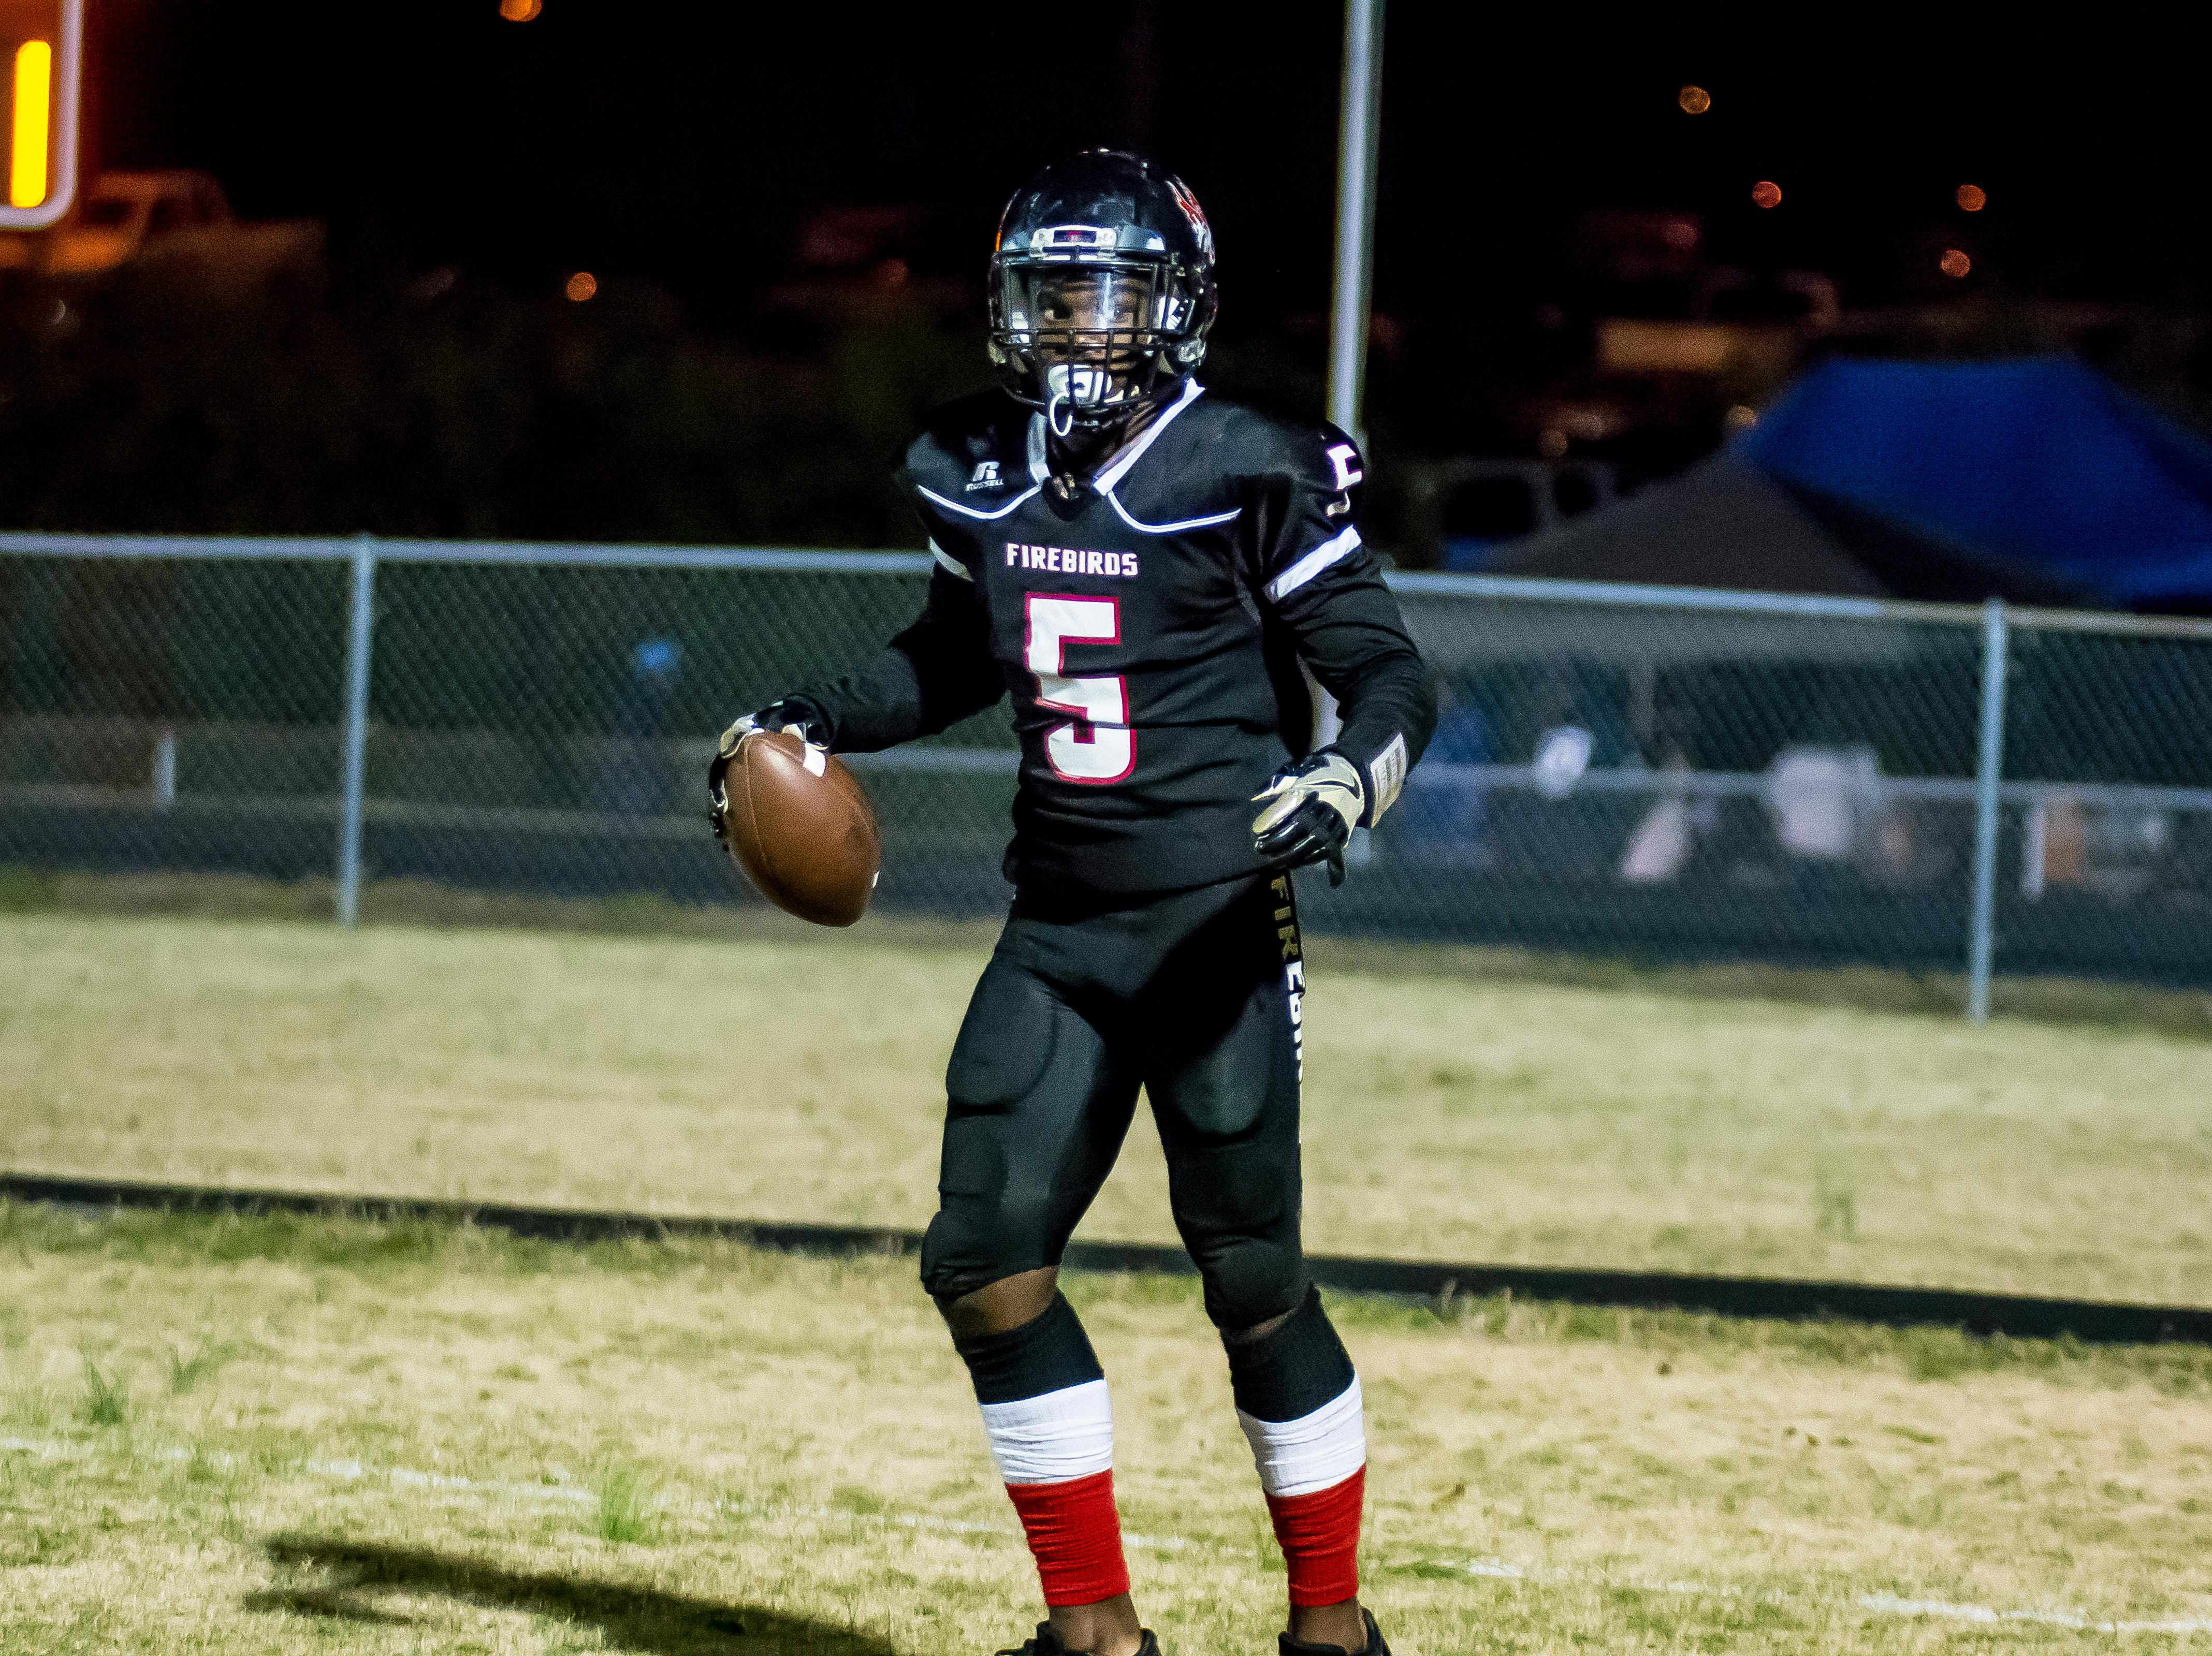 Vanderbilt commitment Jayden Harrison pulls in a touchdown pass.